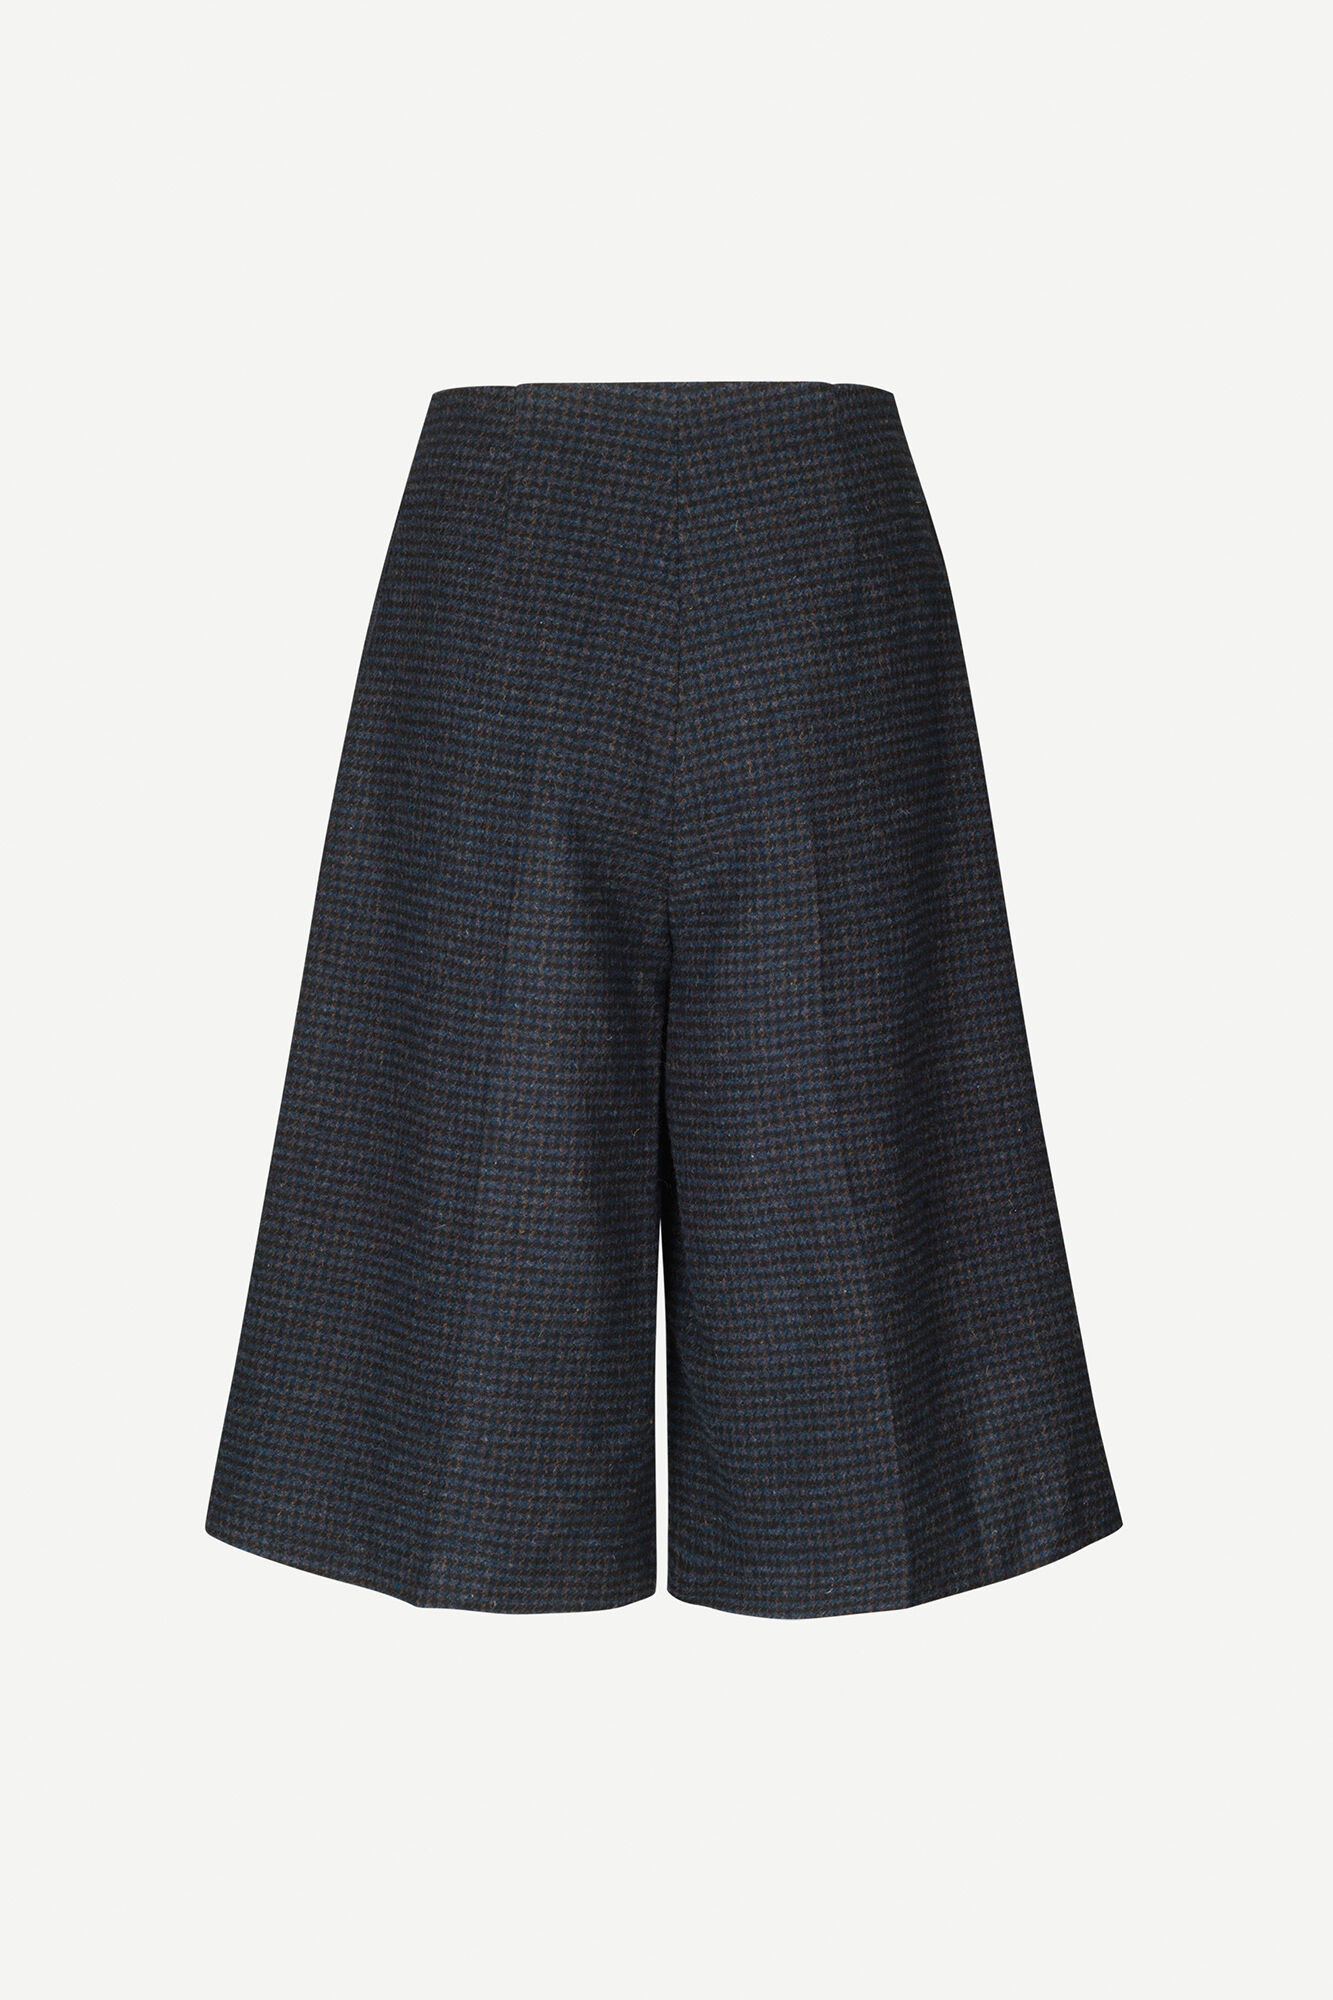 Stone trousers 10878, NIGHT SKY CH.